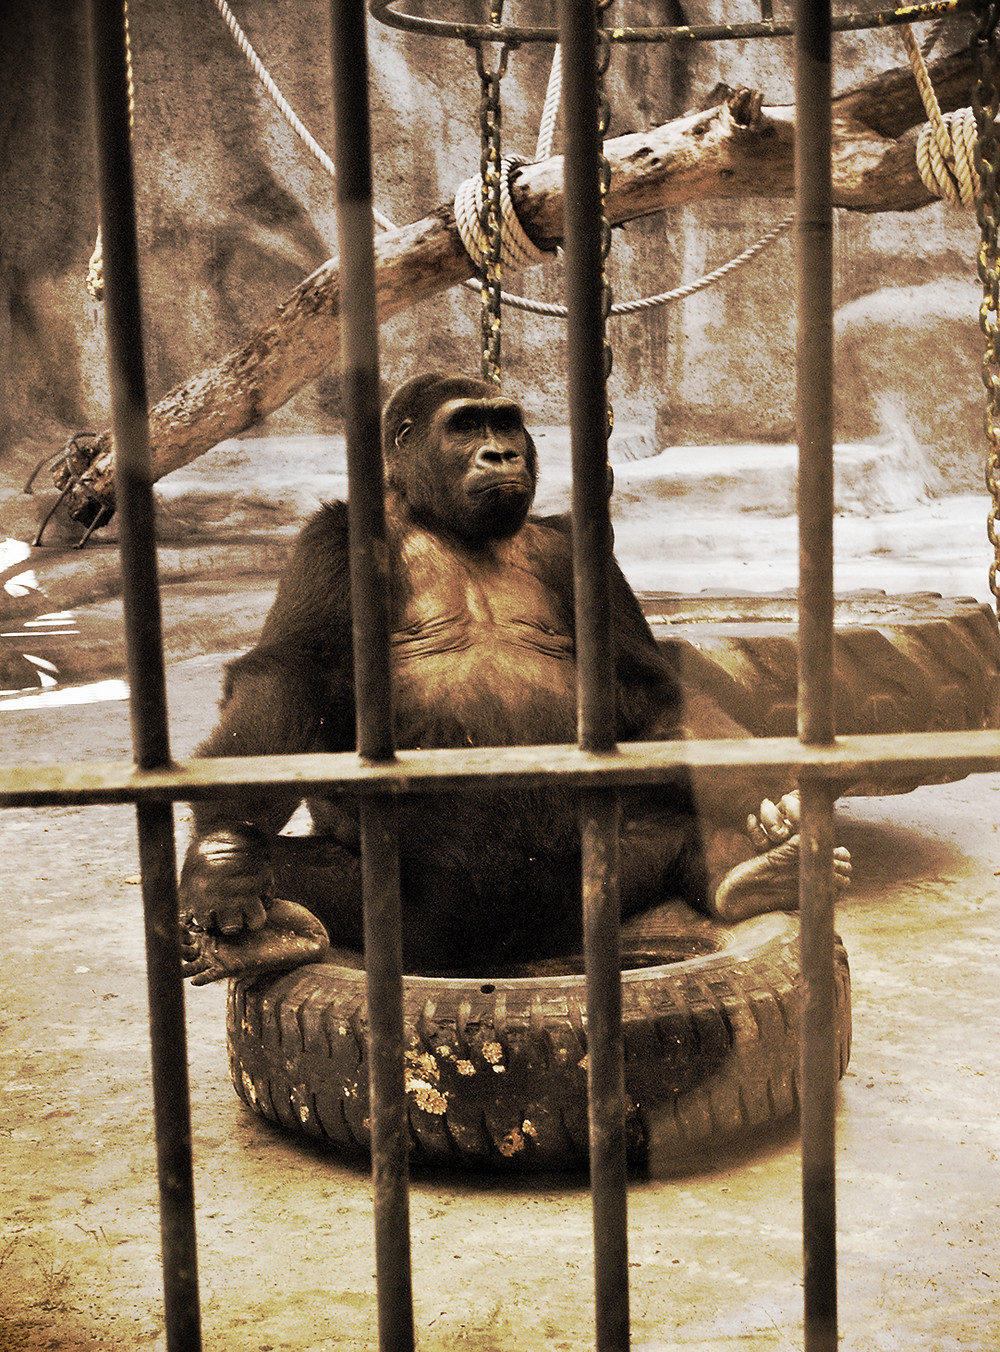 Gorillaen Bua Noi bor alene i den indendørs zoo Pata Zoo.